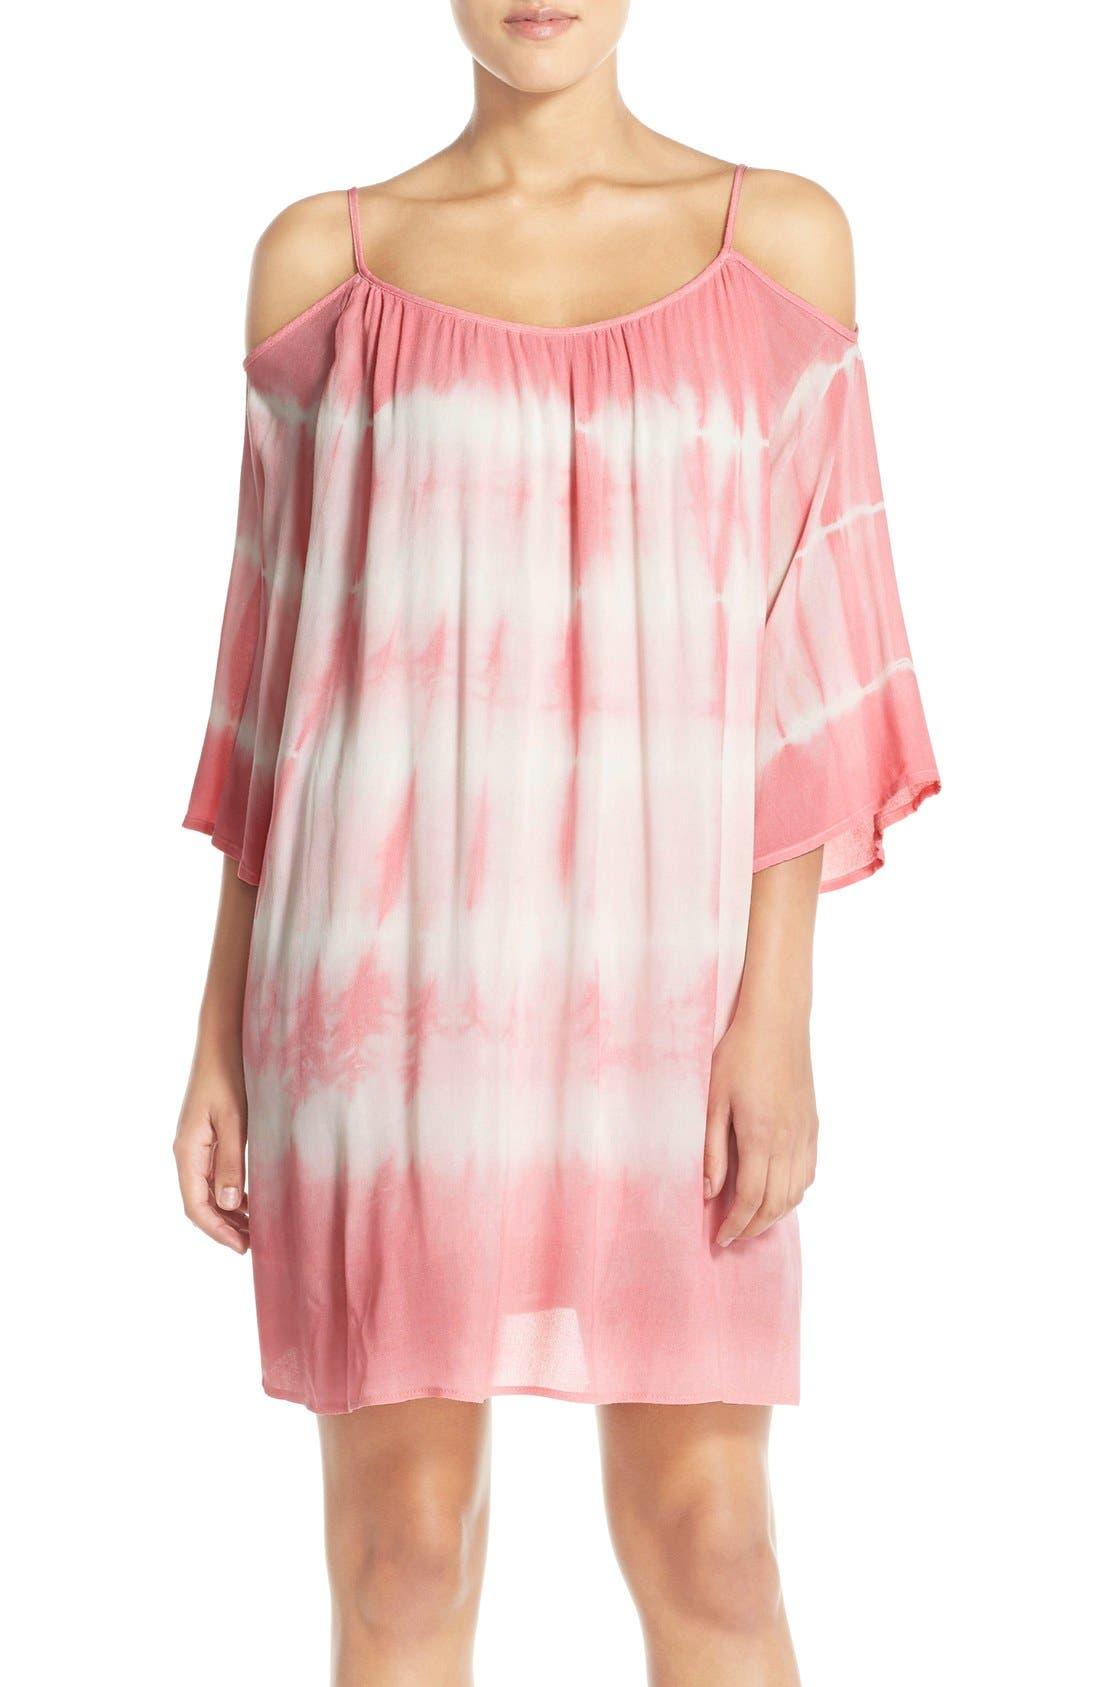 Alternate Image 1 Selected - Fraiche by J Tie Dye Crepe Cold Shoulder Dress